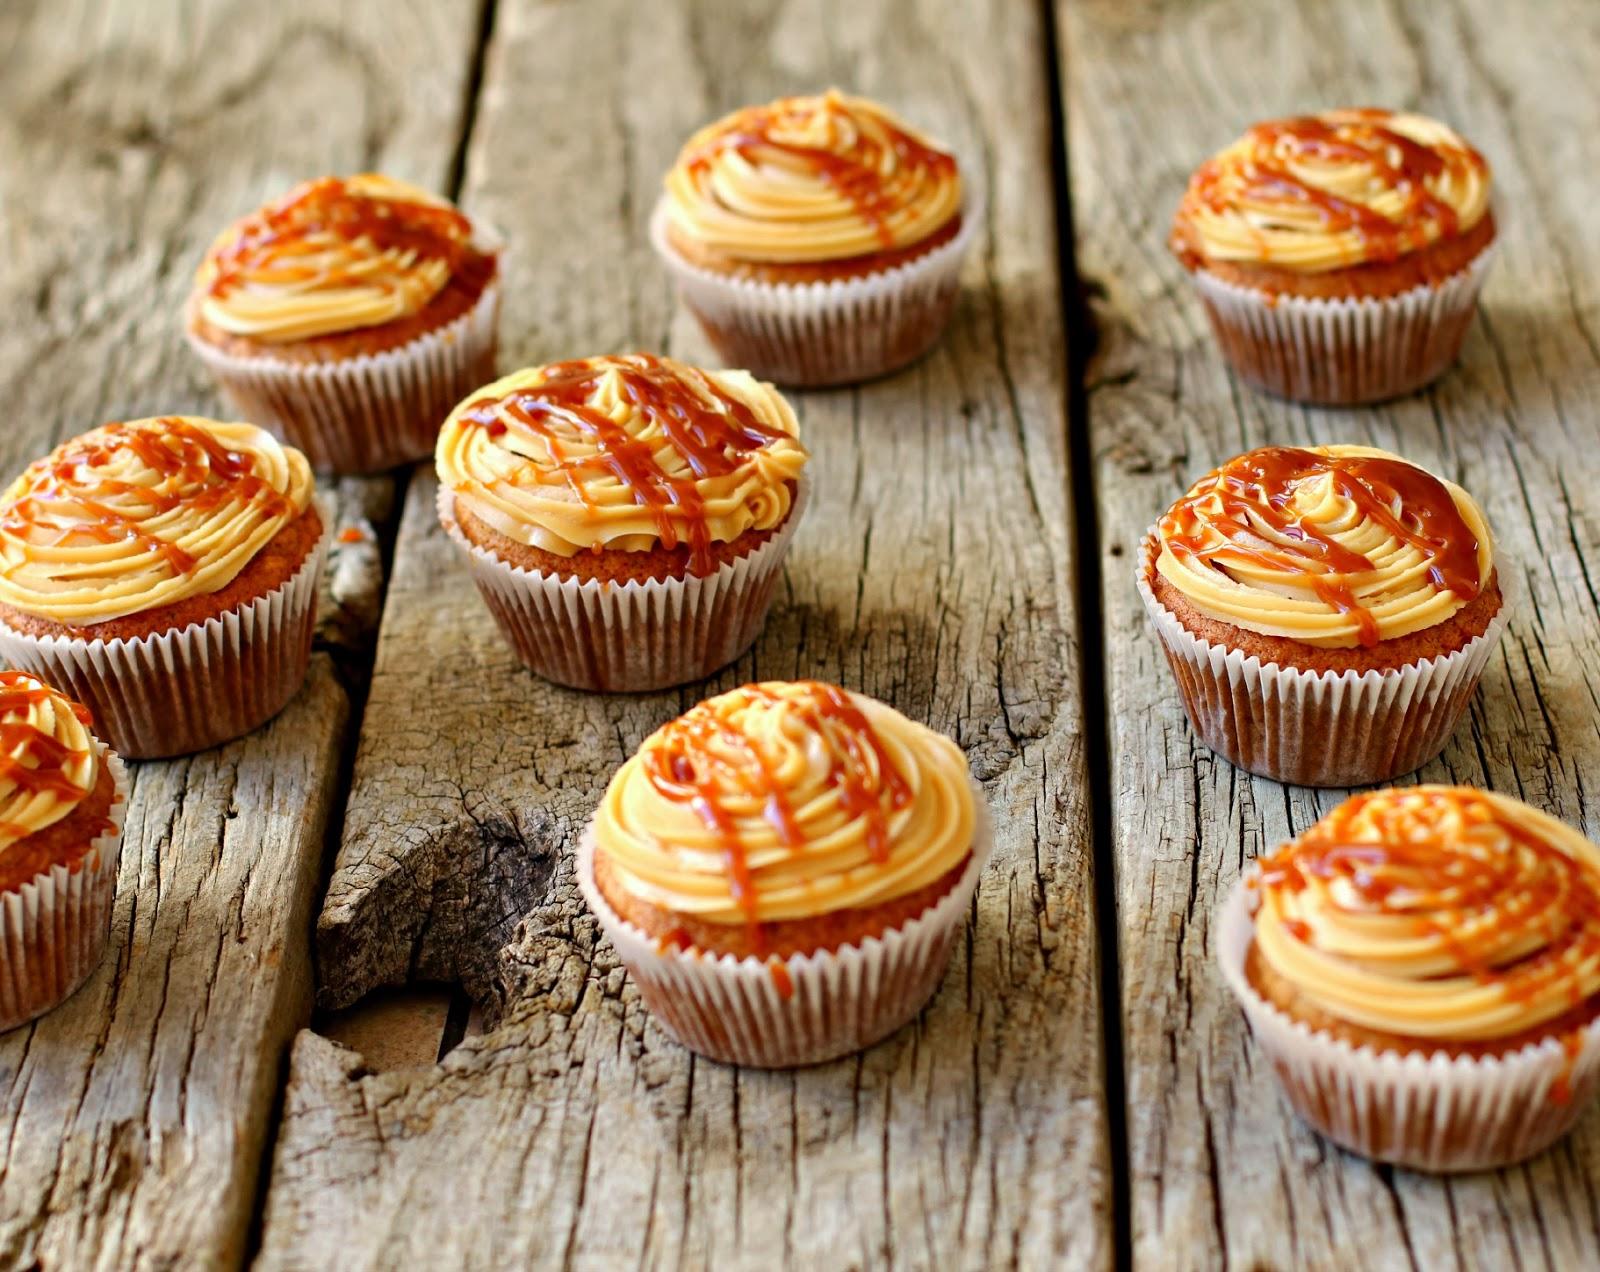 ... Honey: Banana Cupcakes with Rum Caramel Frosting and Rum Caramel Sauce